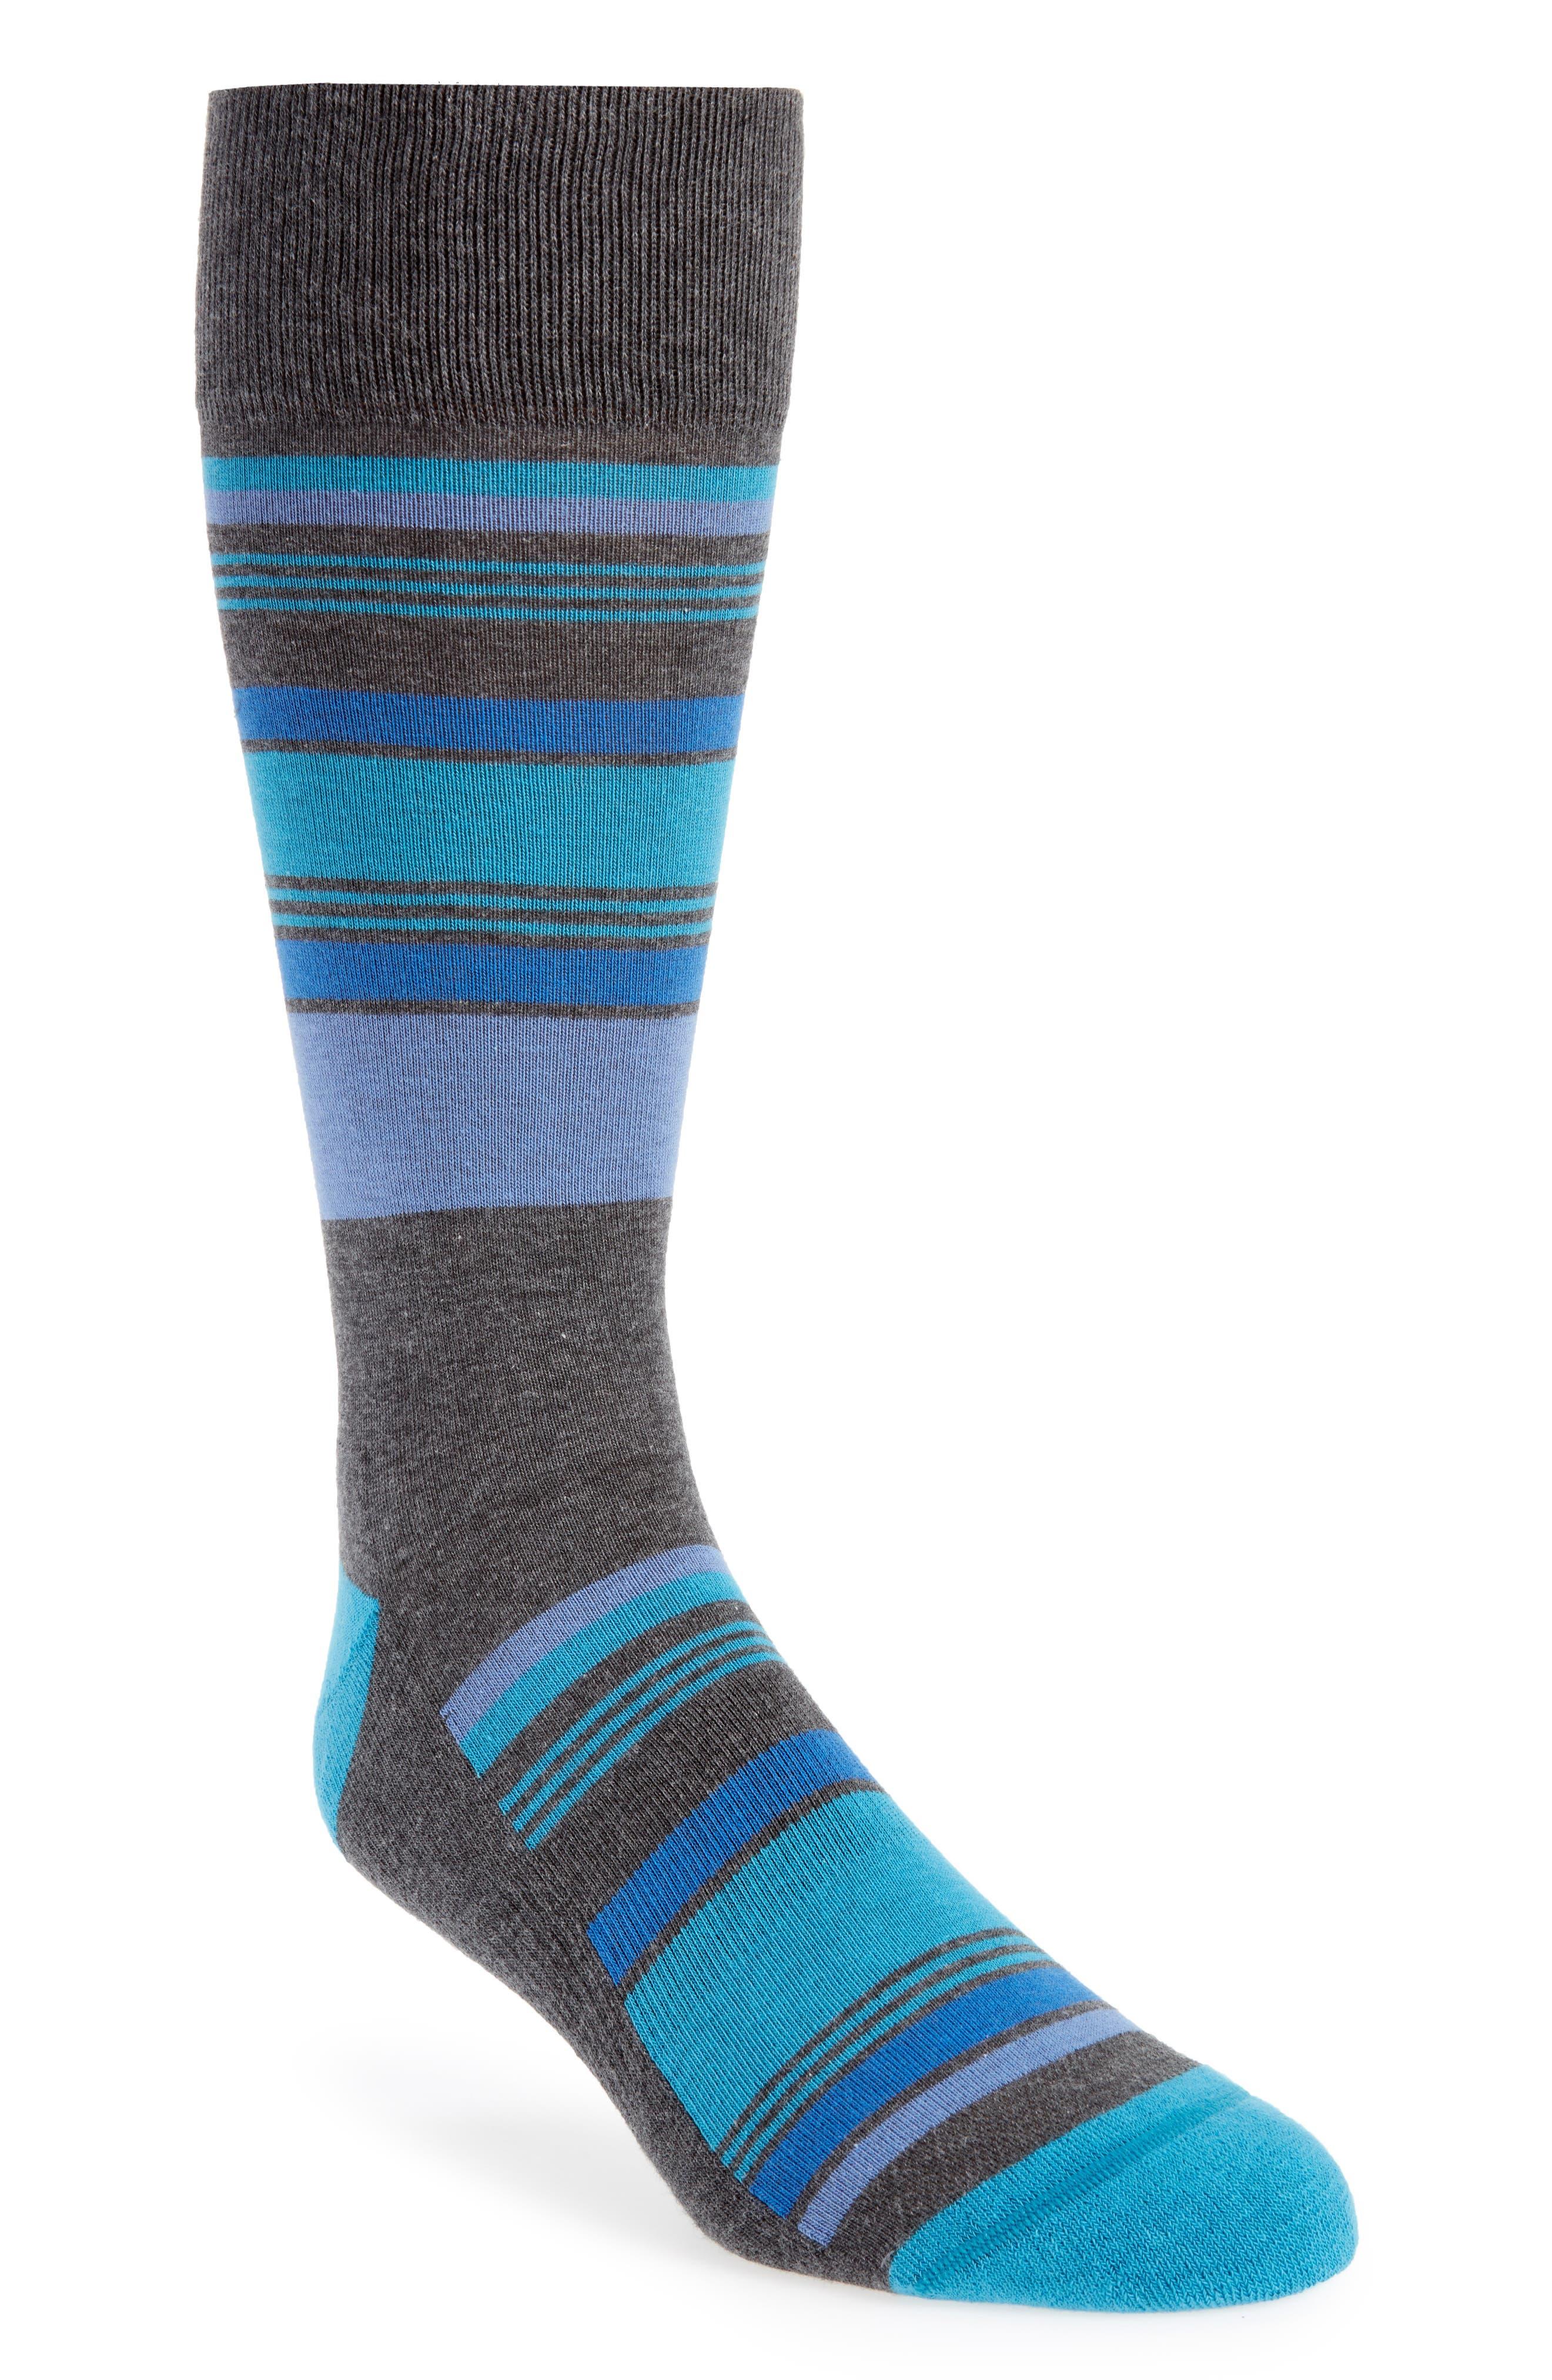 Mixed Uneven Stripe Socks,                         Main,                         color, BLUE/ CHARCOAL